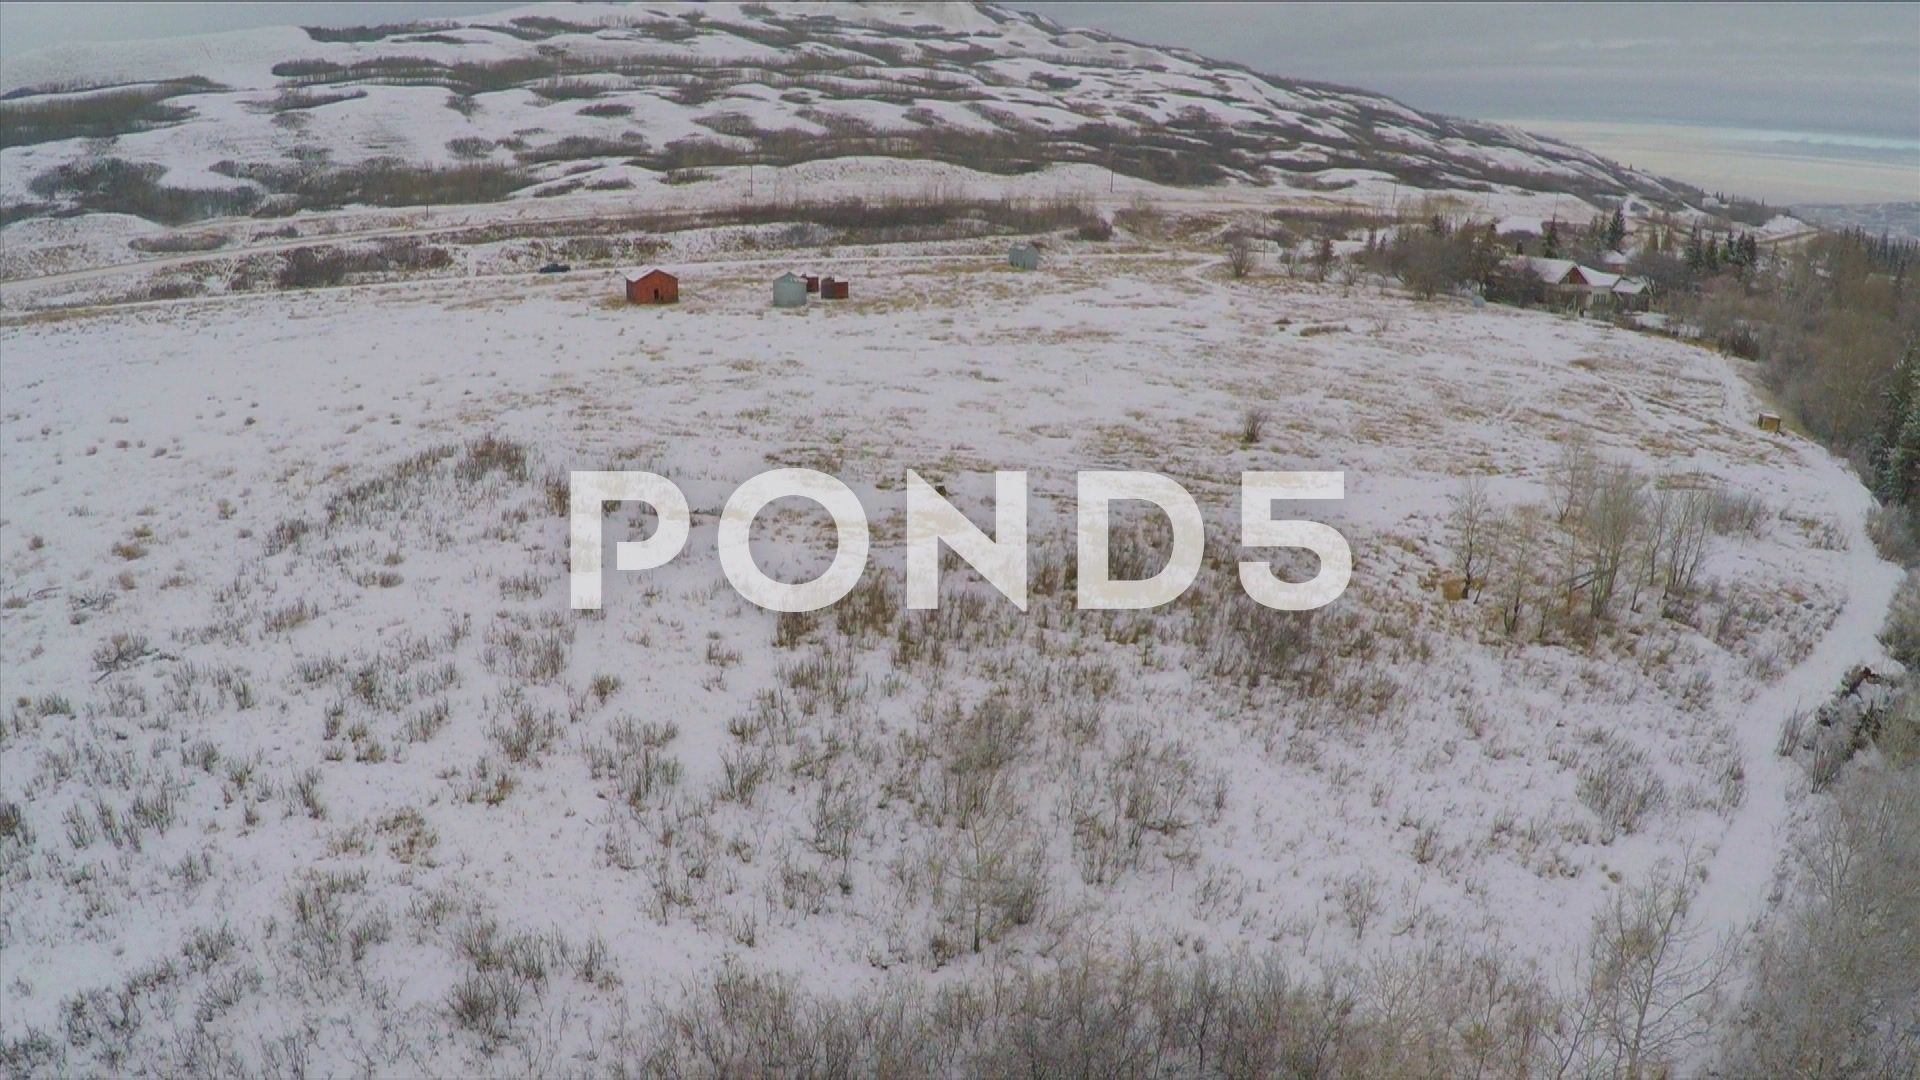 Aerial Shot Abandoned Barn Snow Field Hills Trees Winter Drone Footage - Stock Footage   by RyanJonesFilms